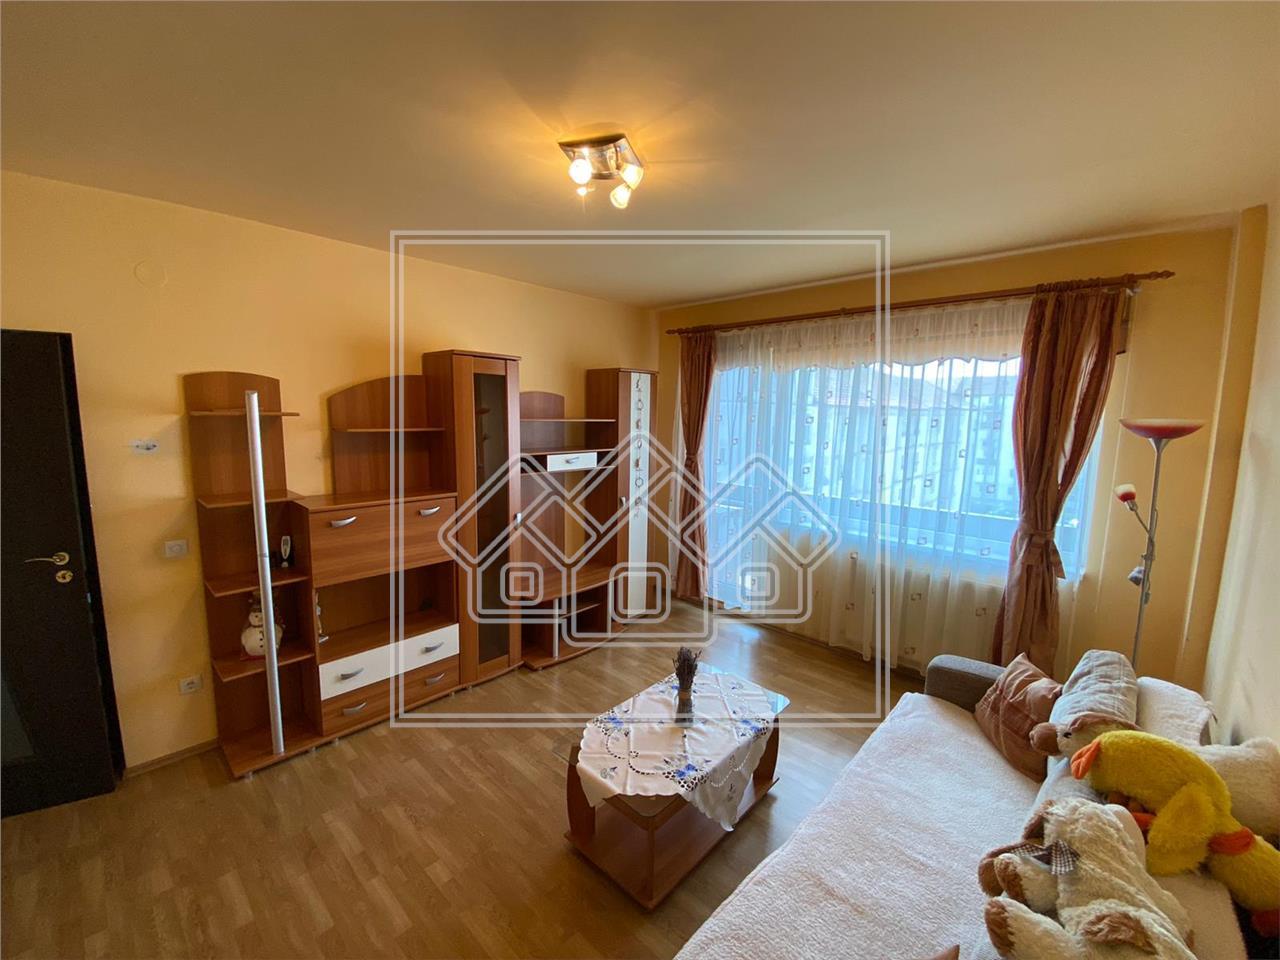 Apartament de vanzare in Sibiu, 2 camere decomandat, etaj intermediar